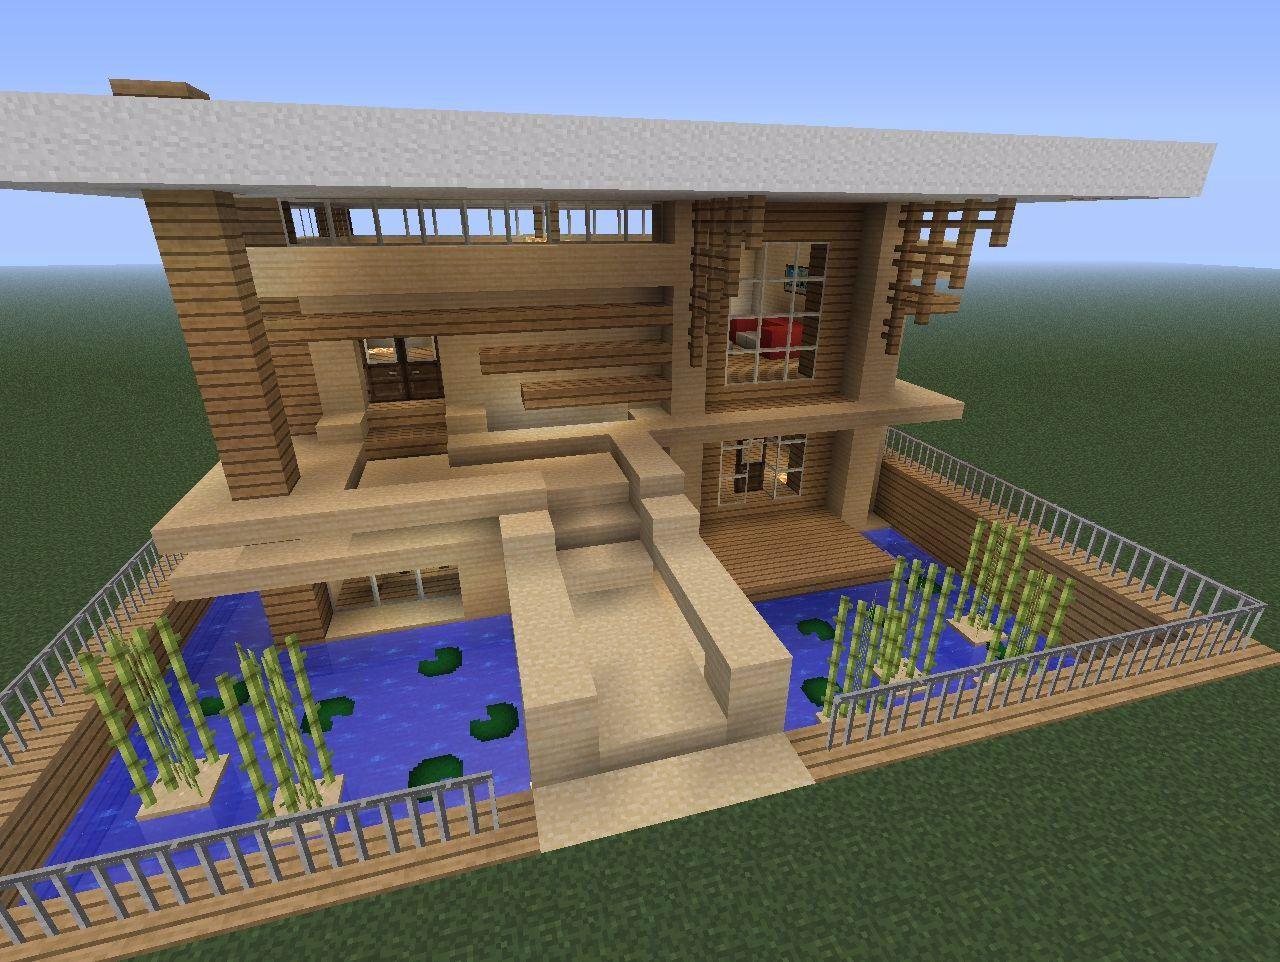 Minecraft house i wish it was my house minecraft pinterest minec - Construction maison minecraft ...